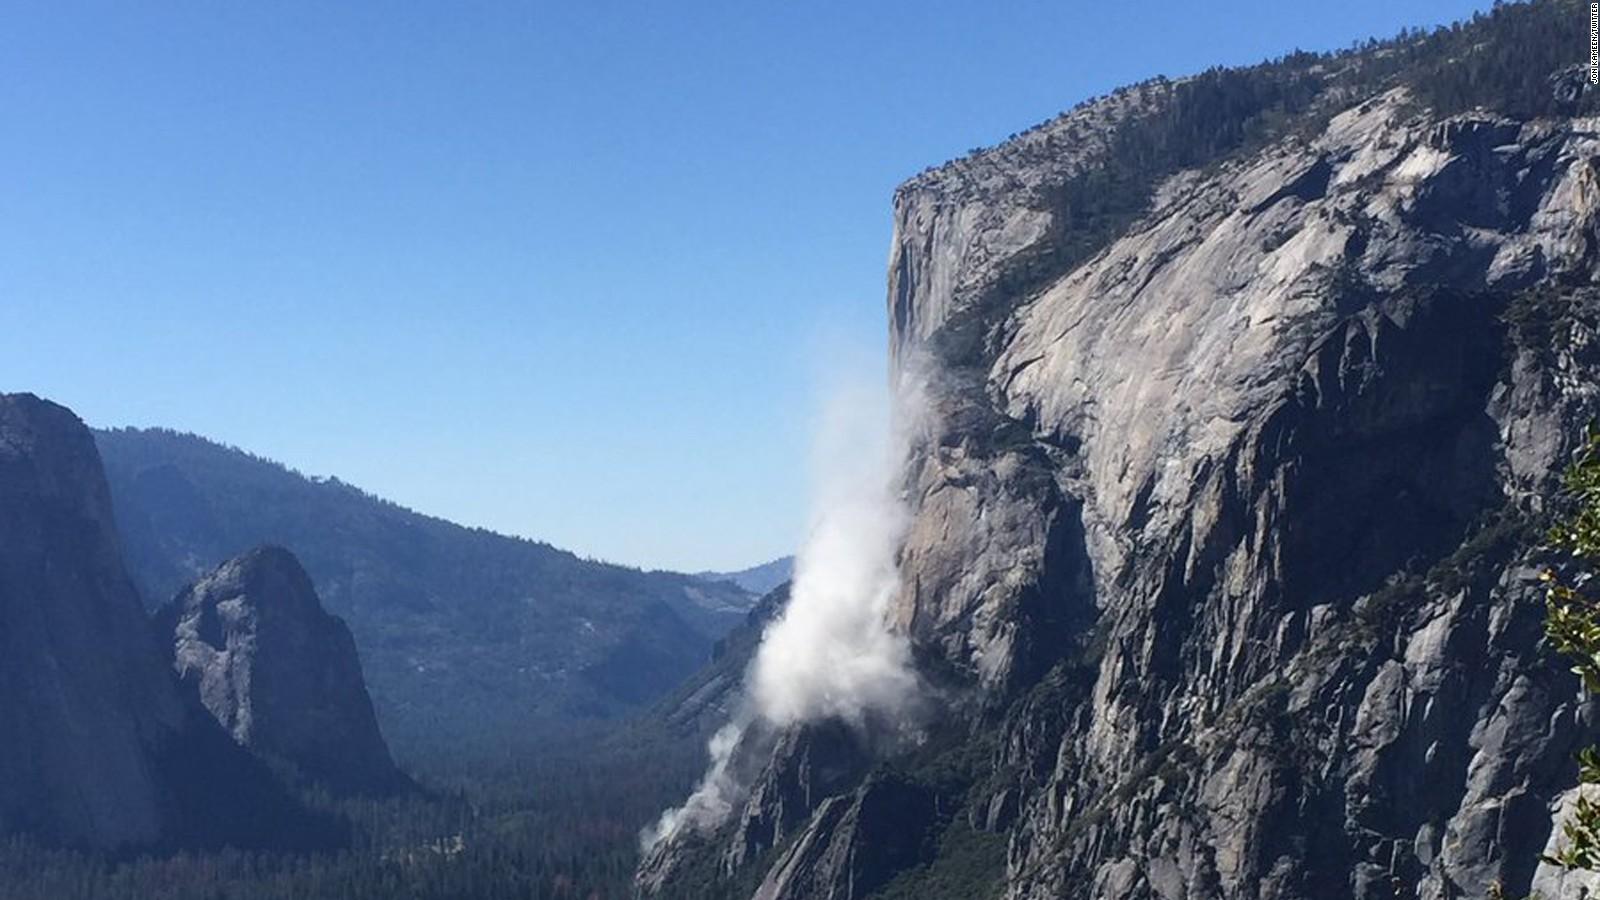 home design studio pro. Home Design Studio Pro Yosemite  another rockfall at yosemite u0027s el capitan injures one cnn 100 How Can I